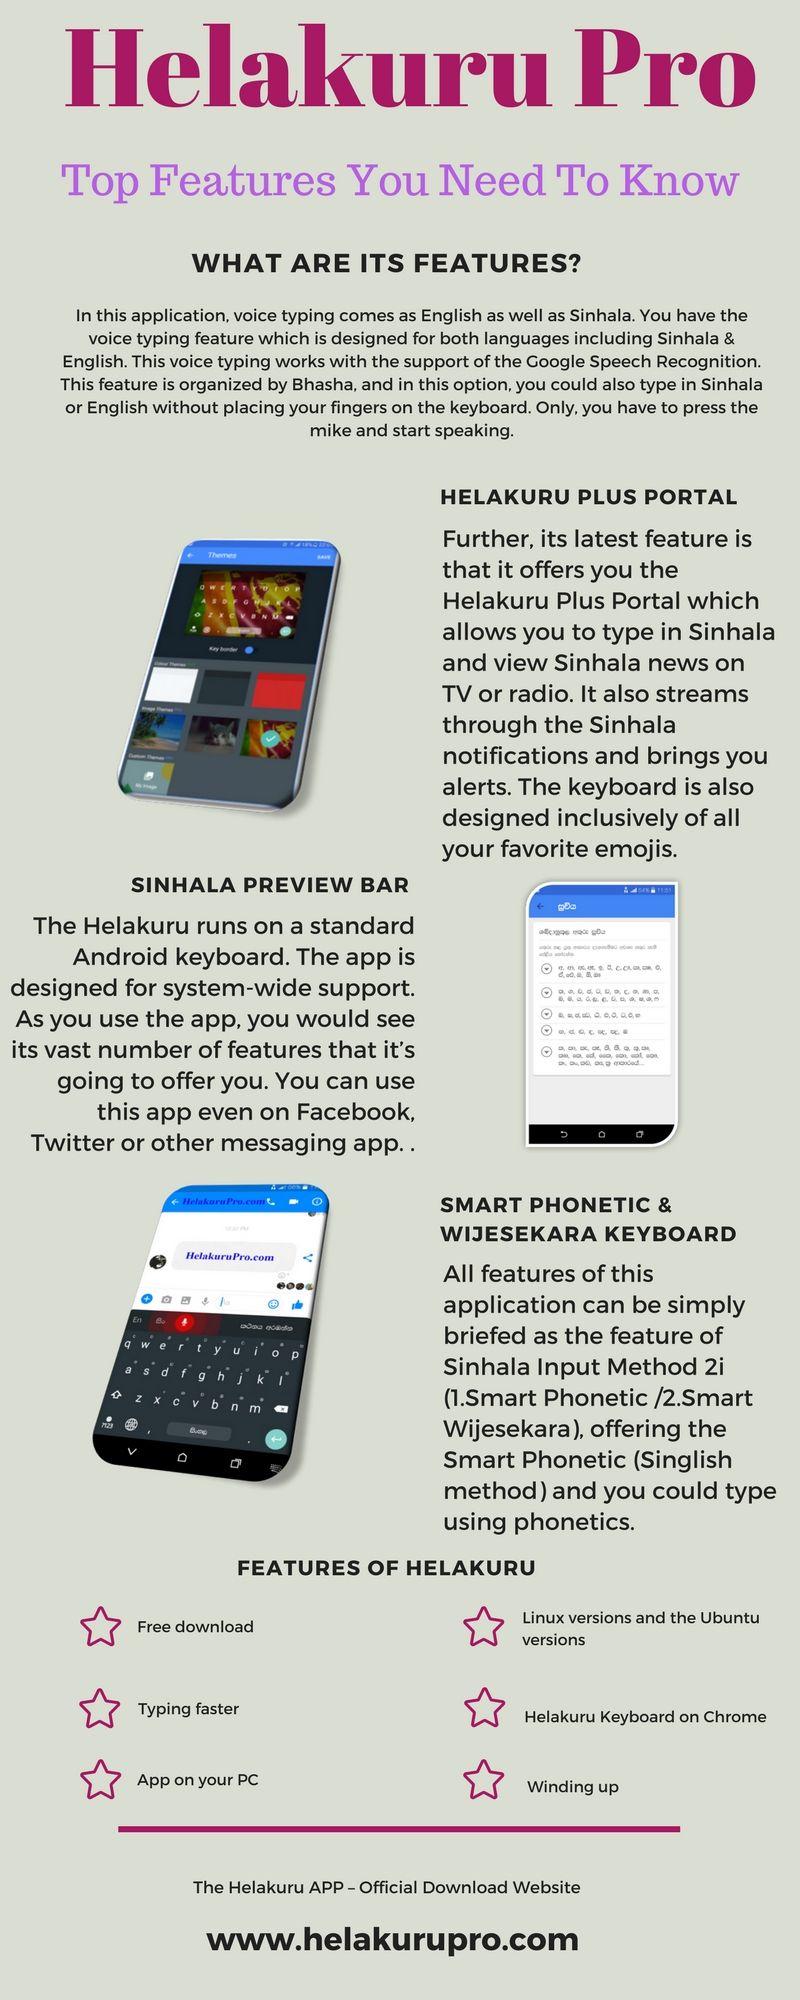 Helakuru App Top Features You Need To Know | Helakuru Pro ...